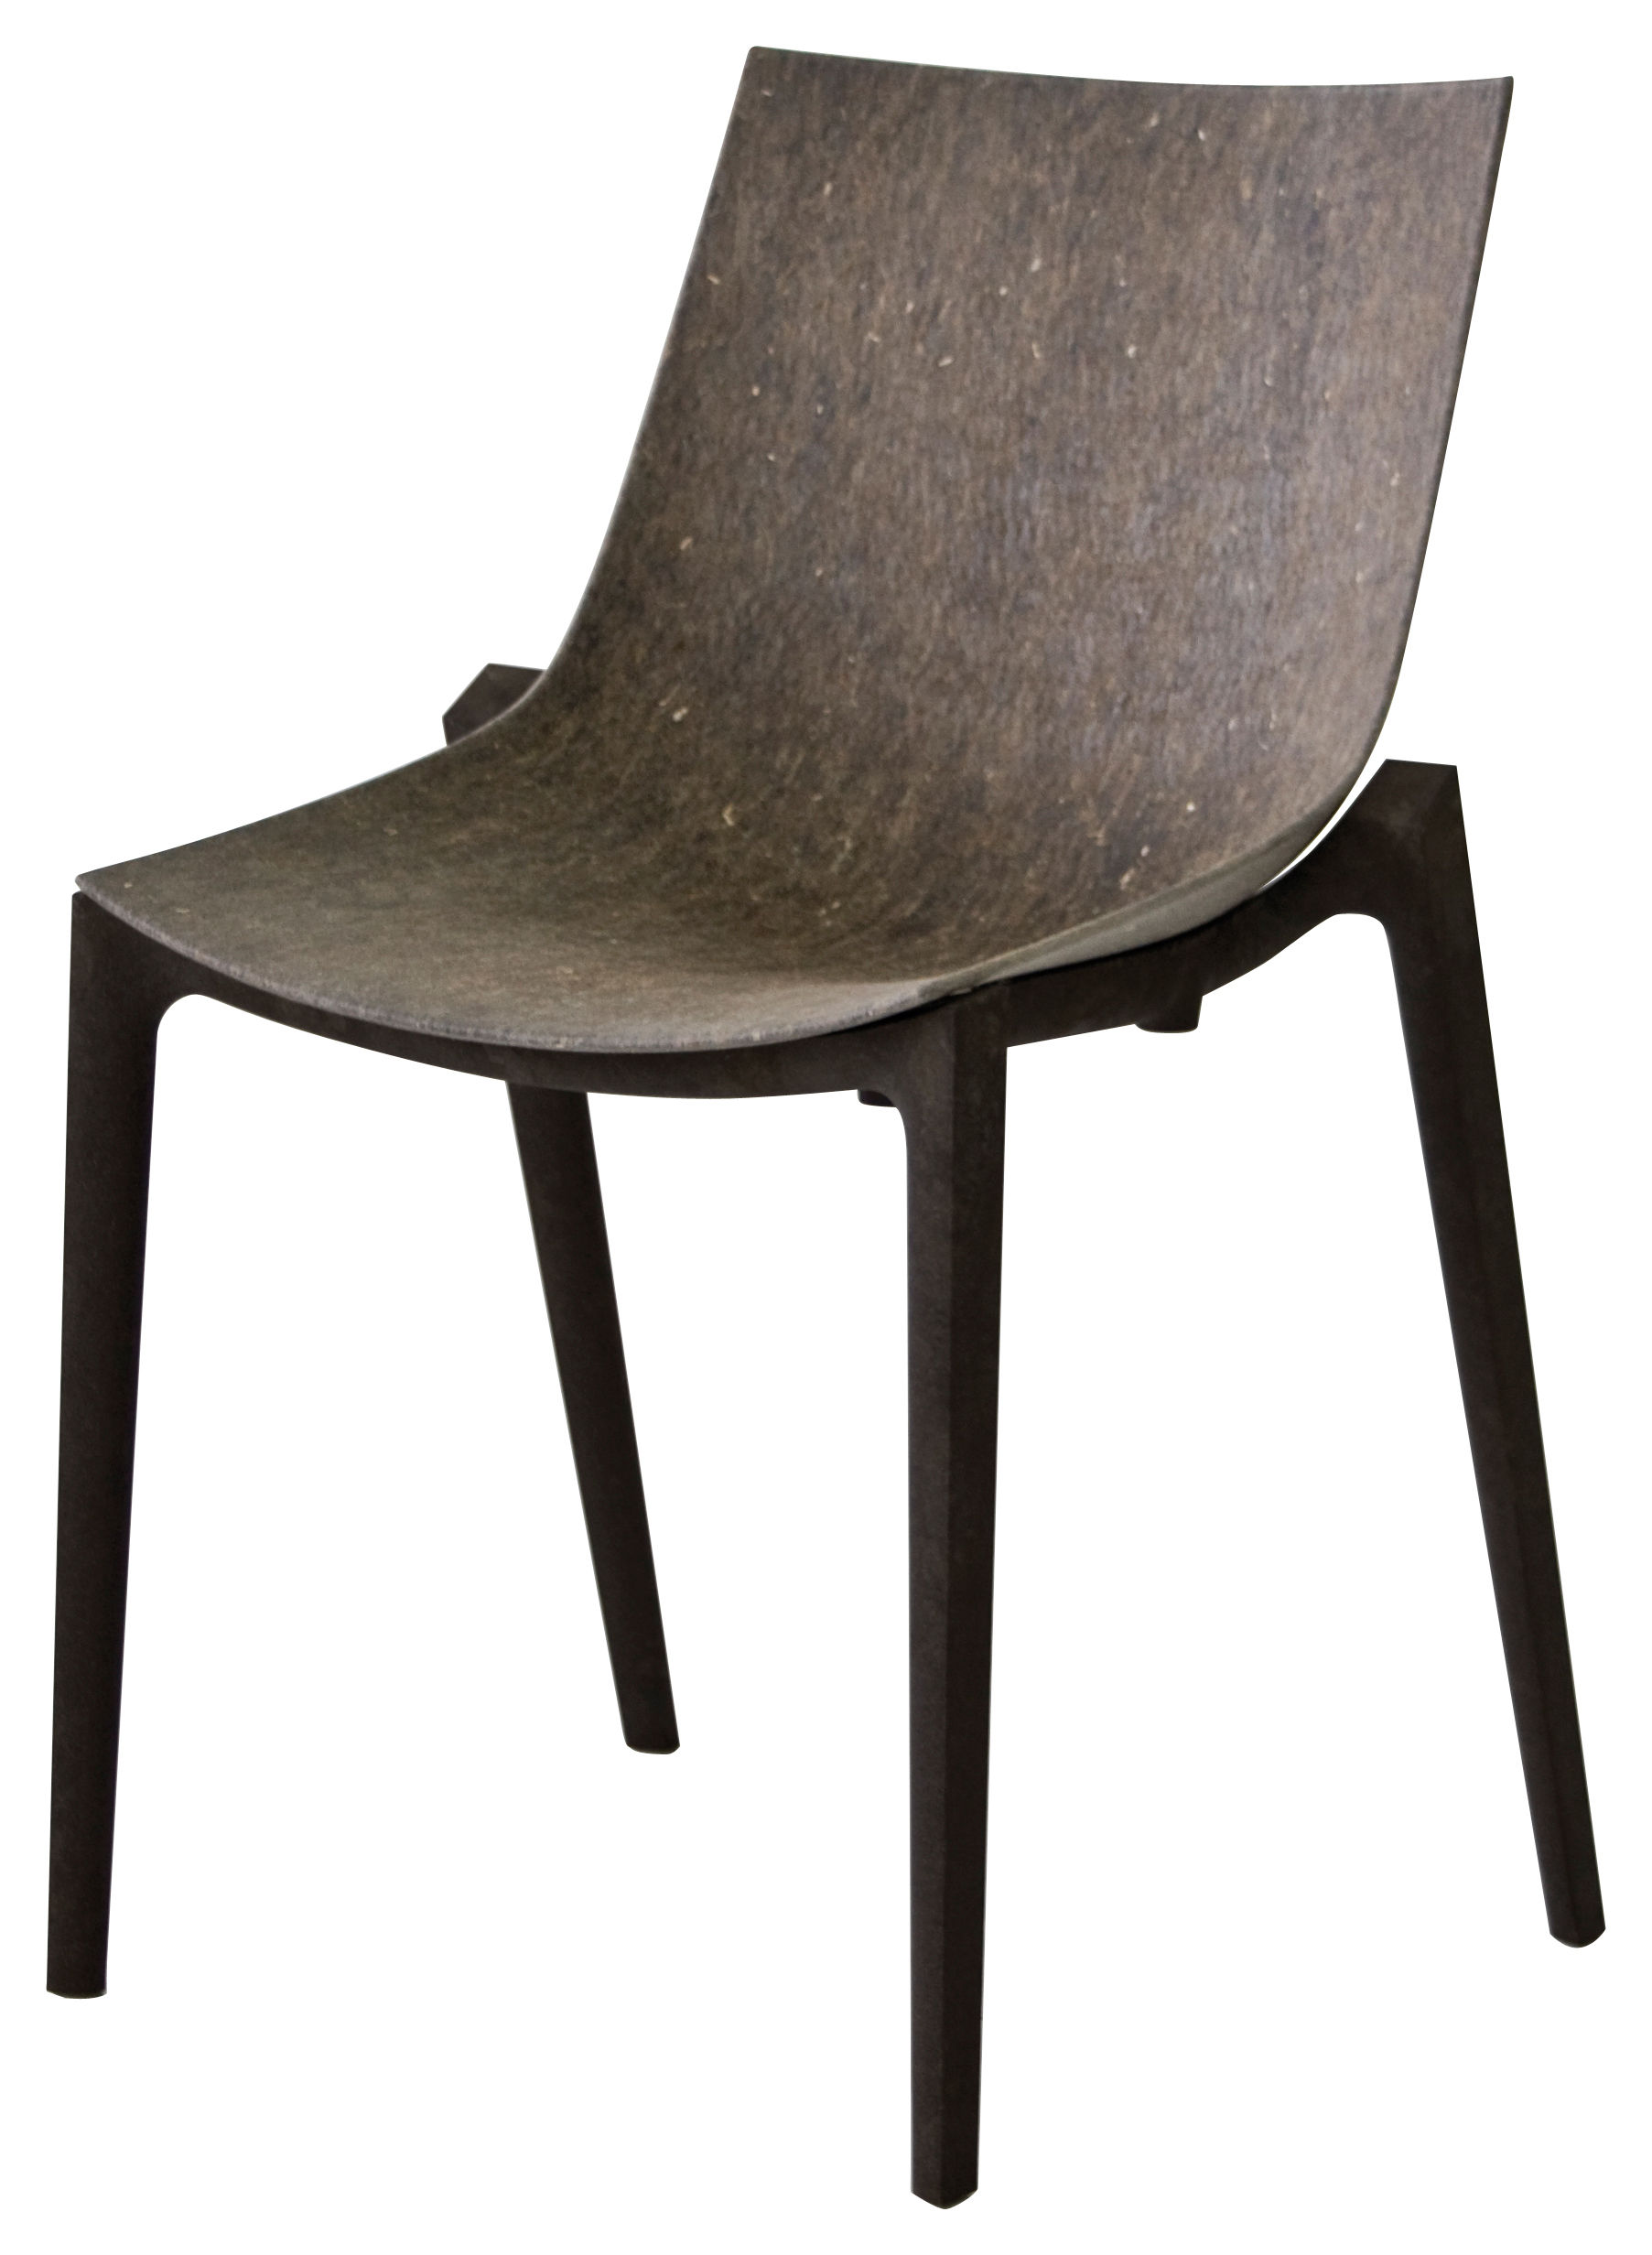 Zartan eco stackable chair hemp fiber grey seat dark for Chaise de philippe starck